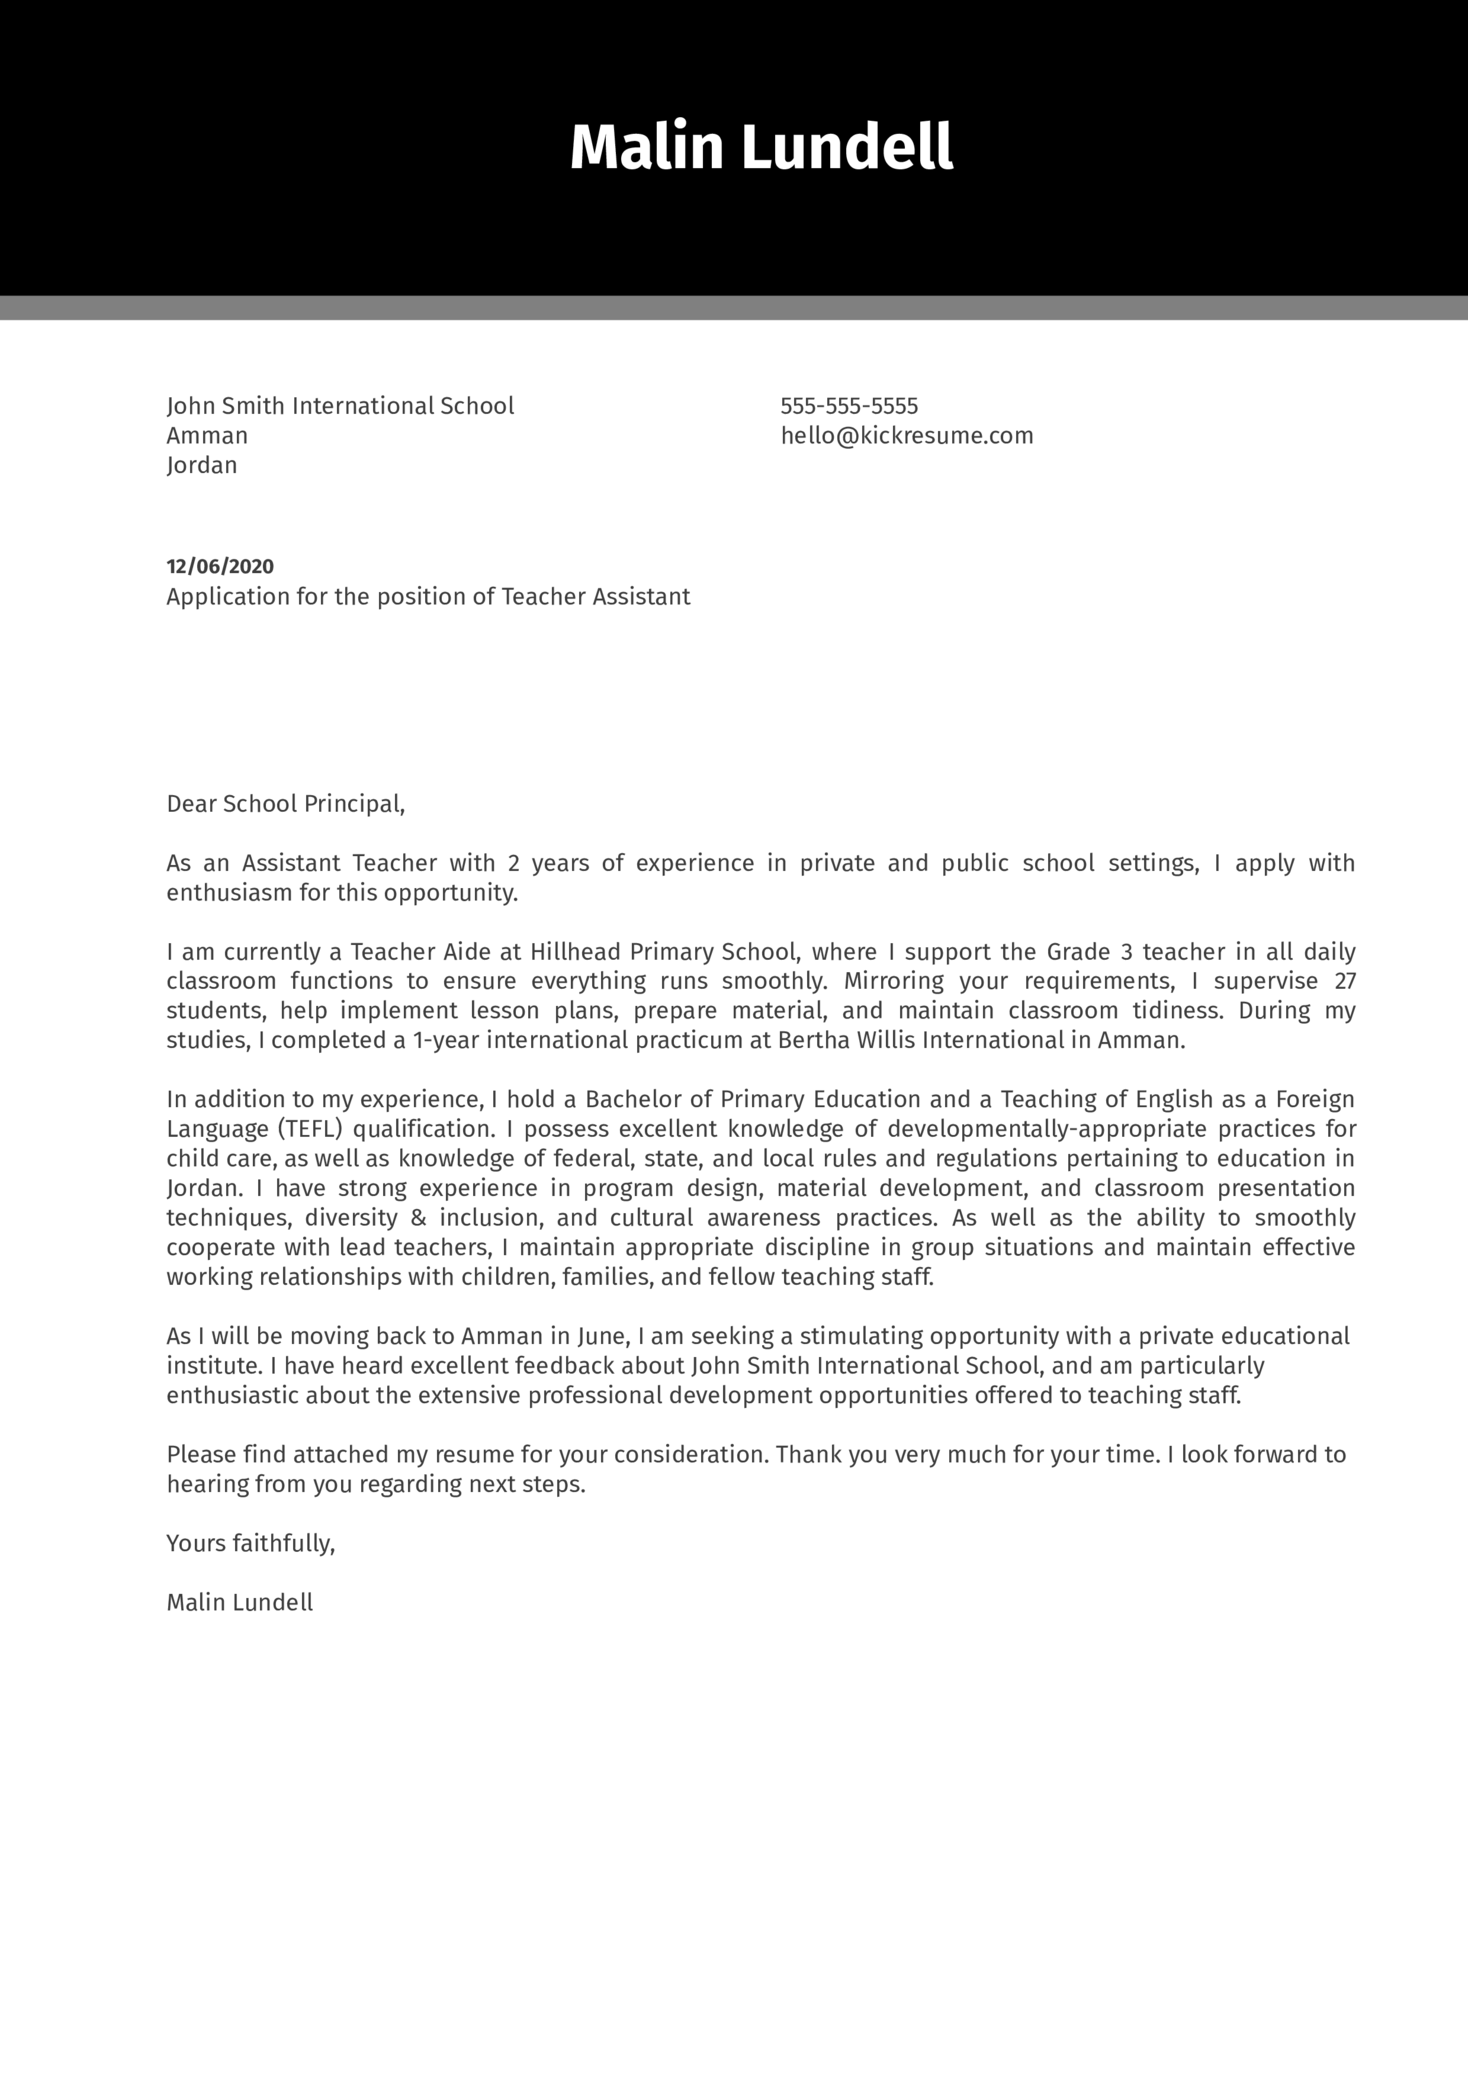 Teacher Assistant Cover Letter Example